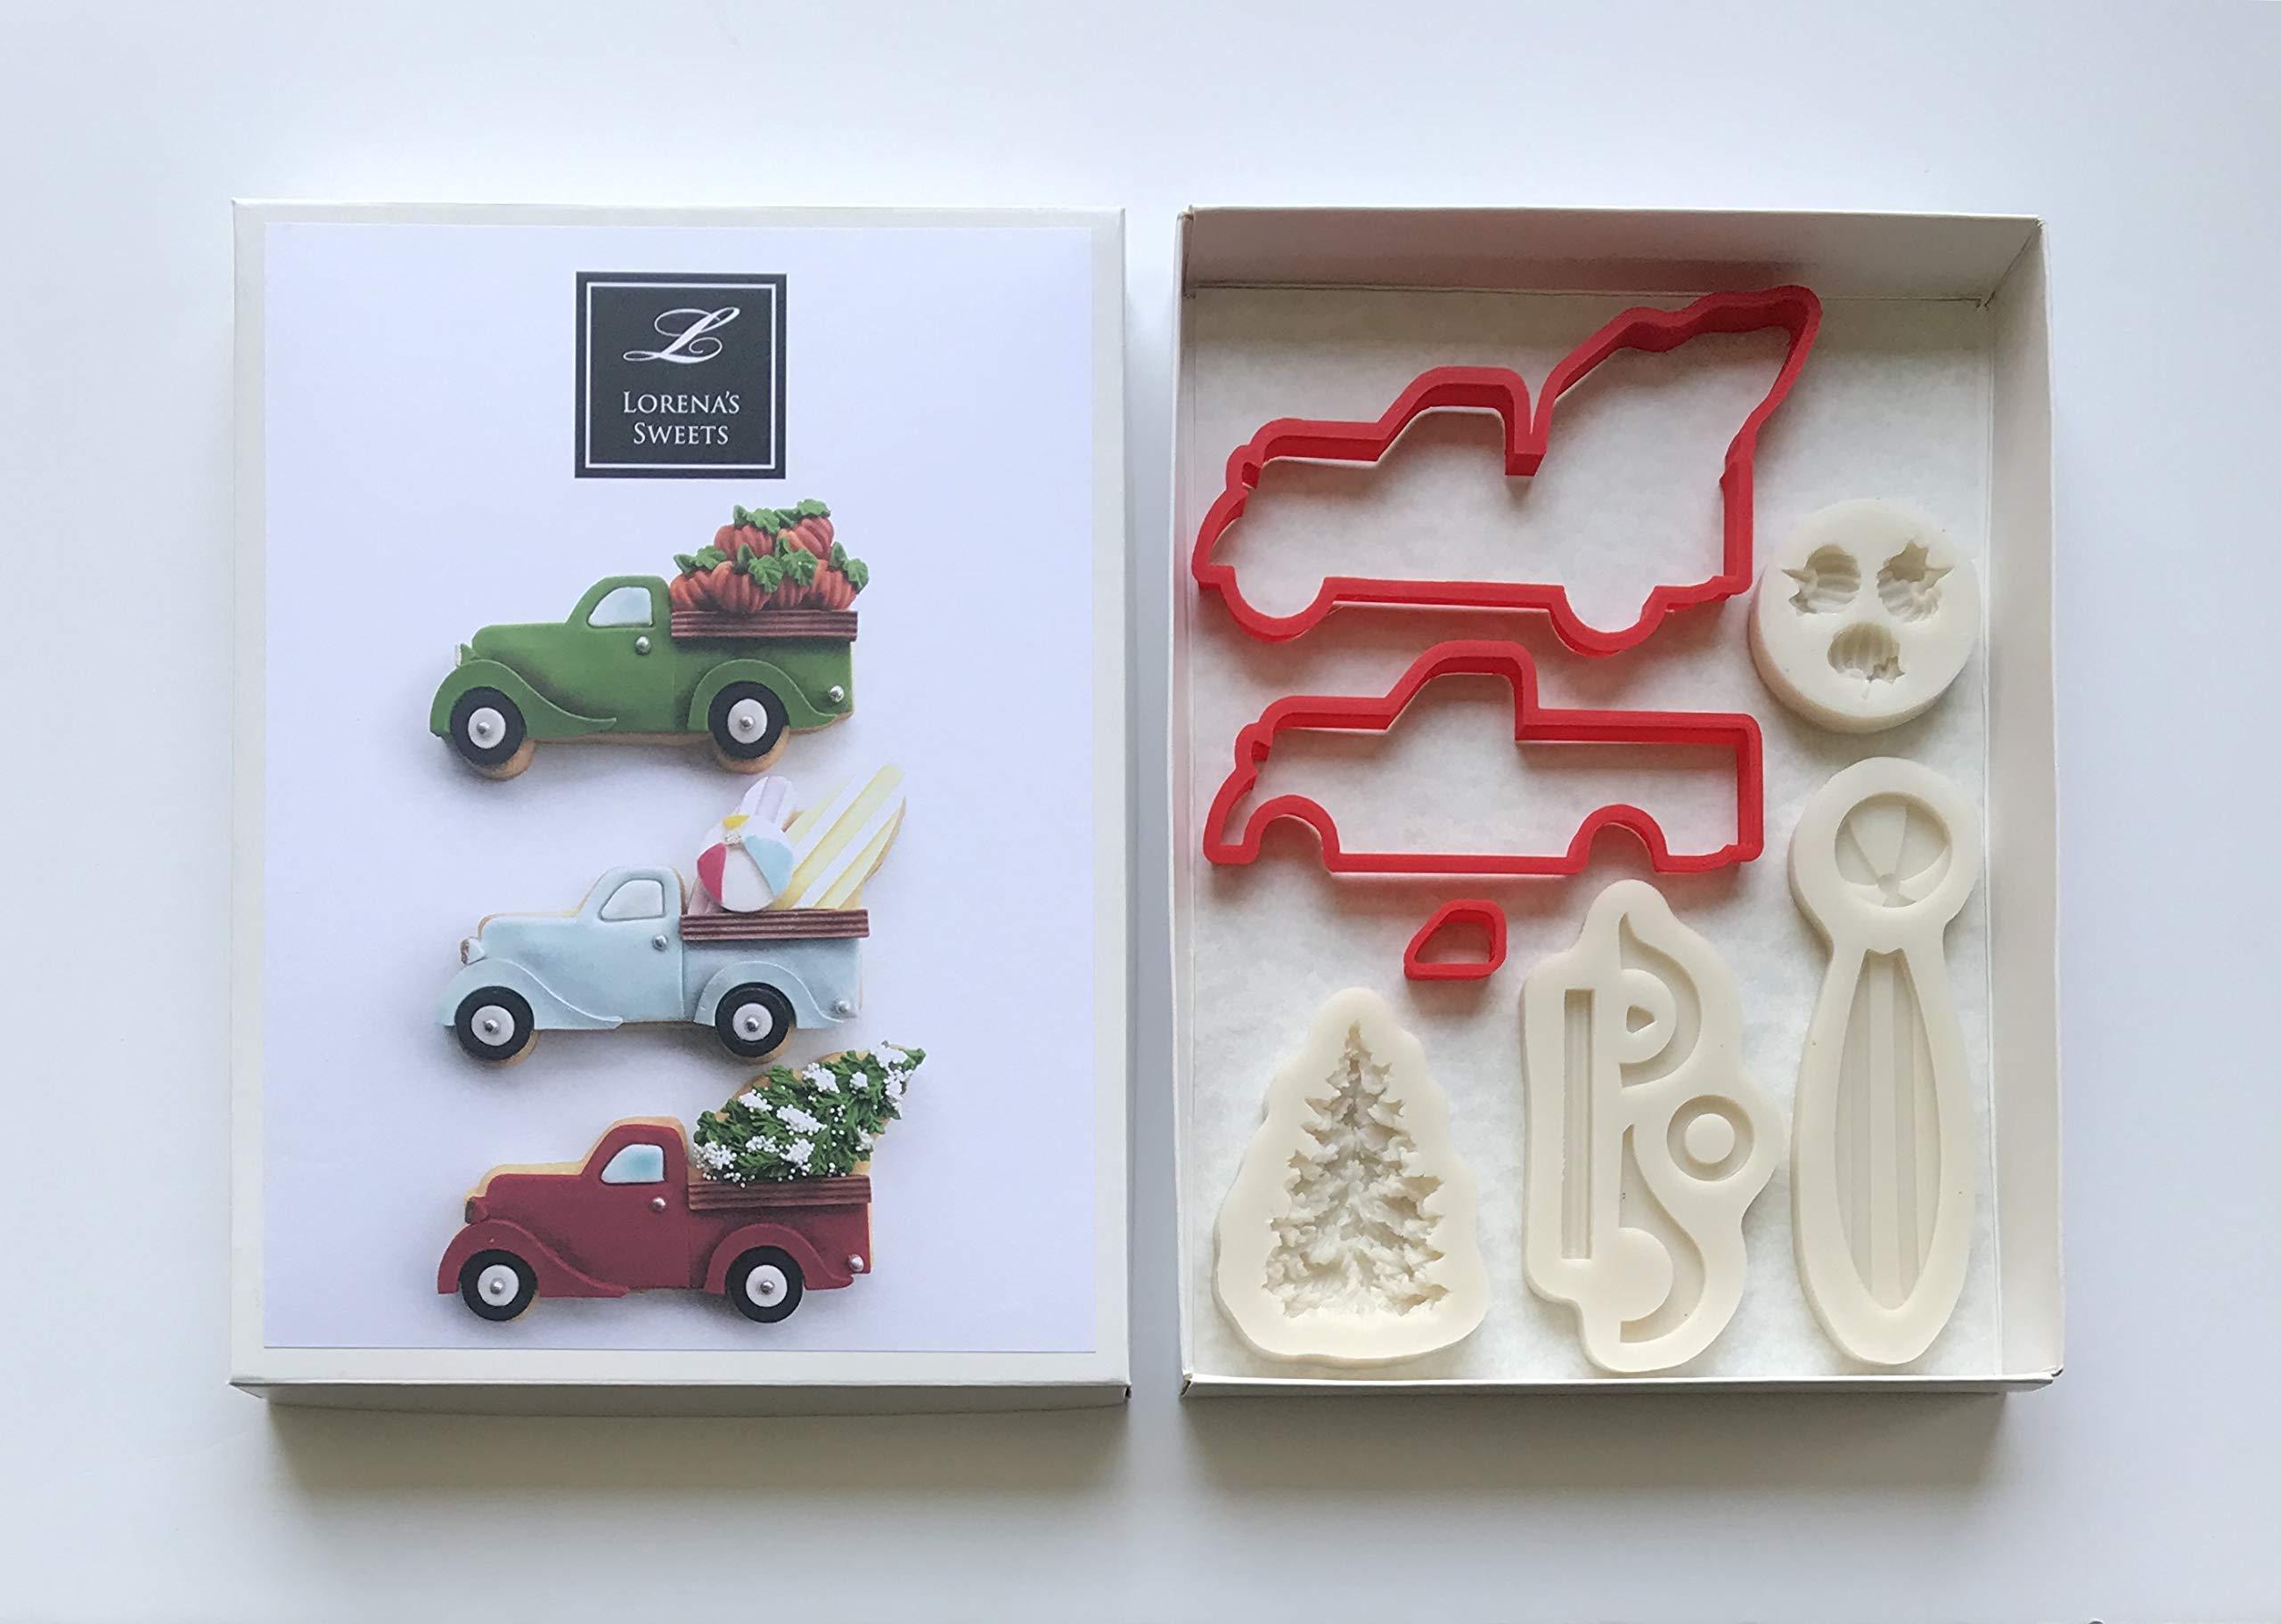 Lorena´s Sweet Fondant Cookie Cutter Kit Pickup Truck